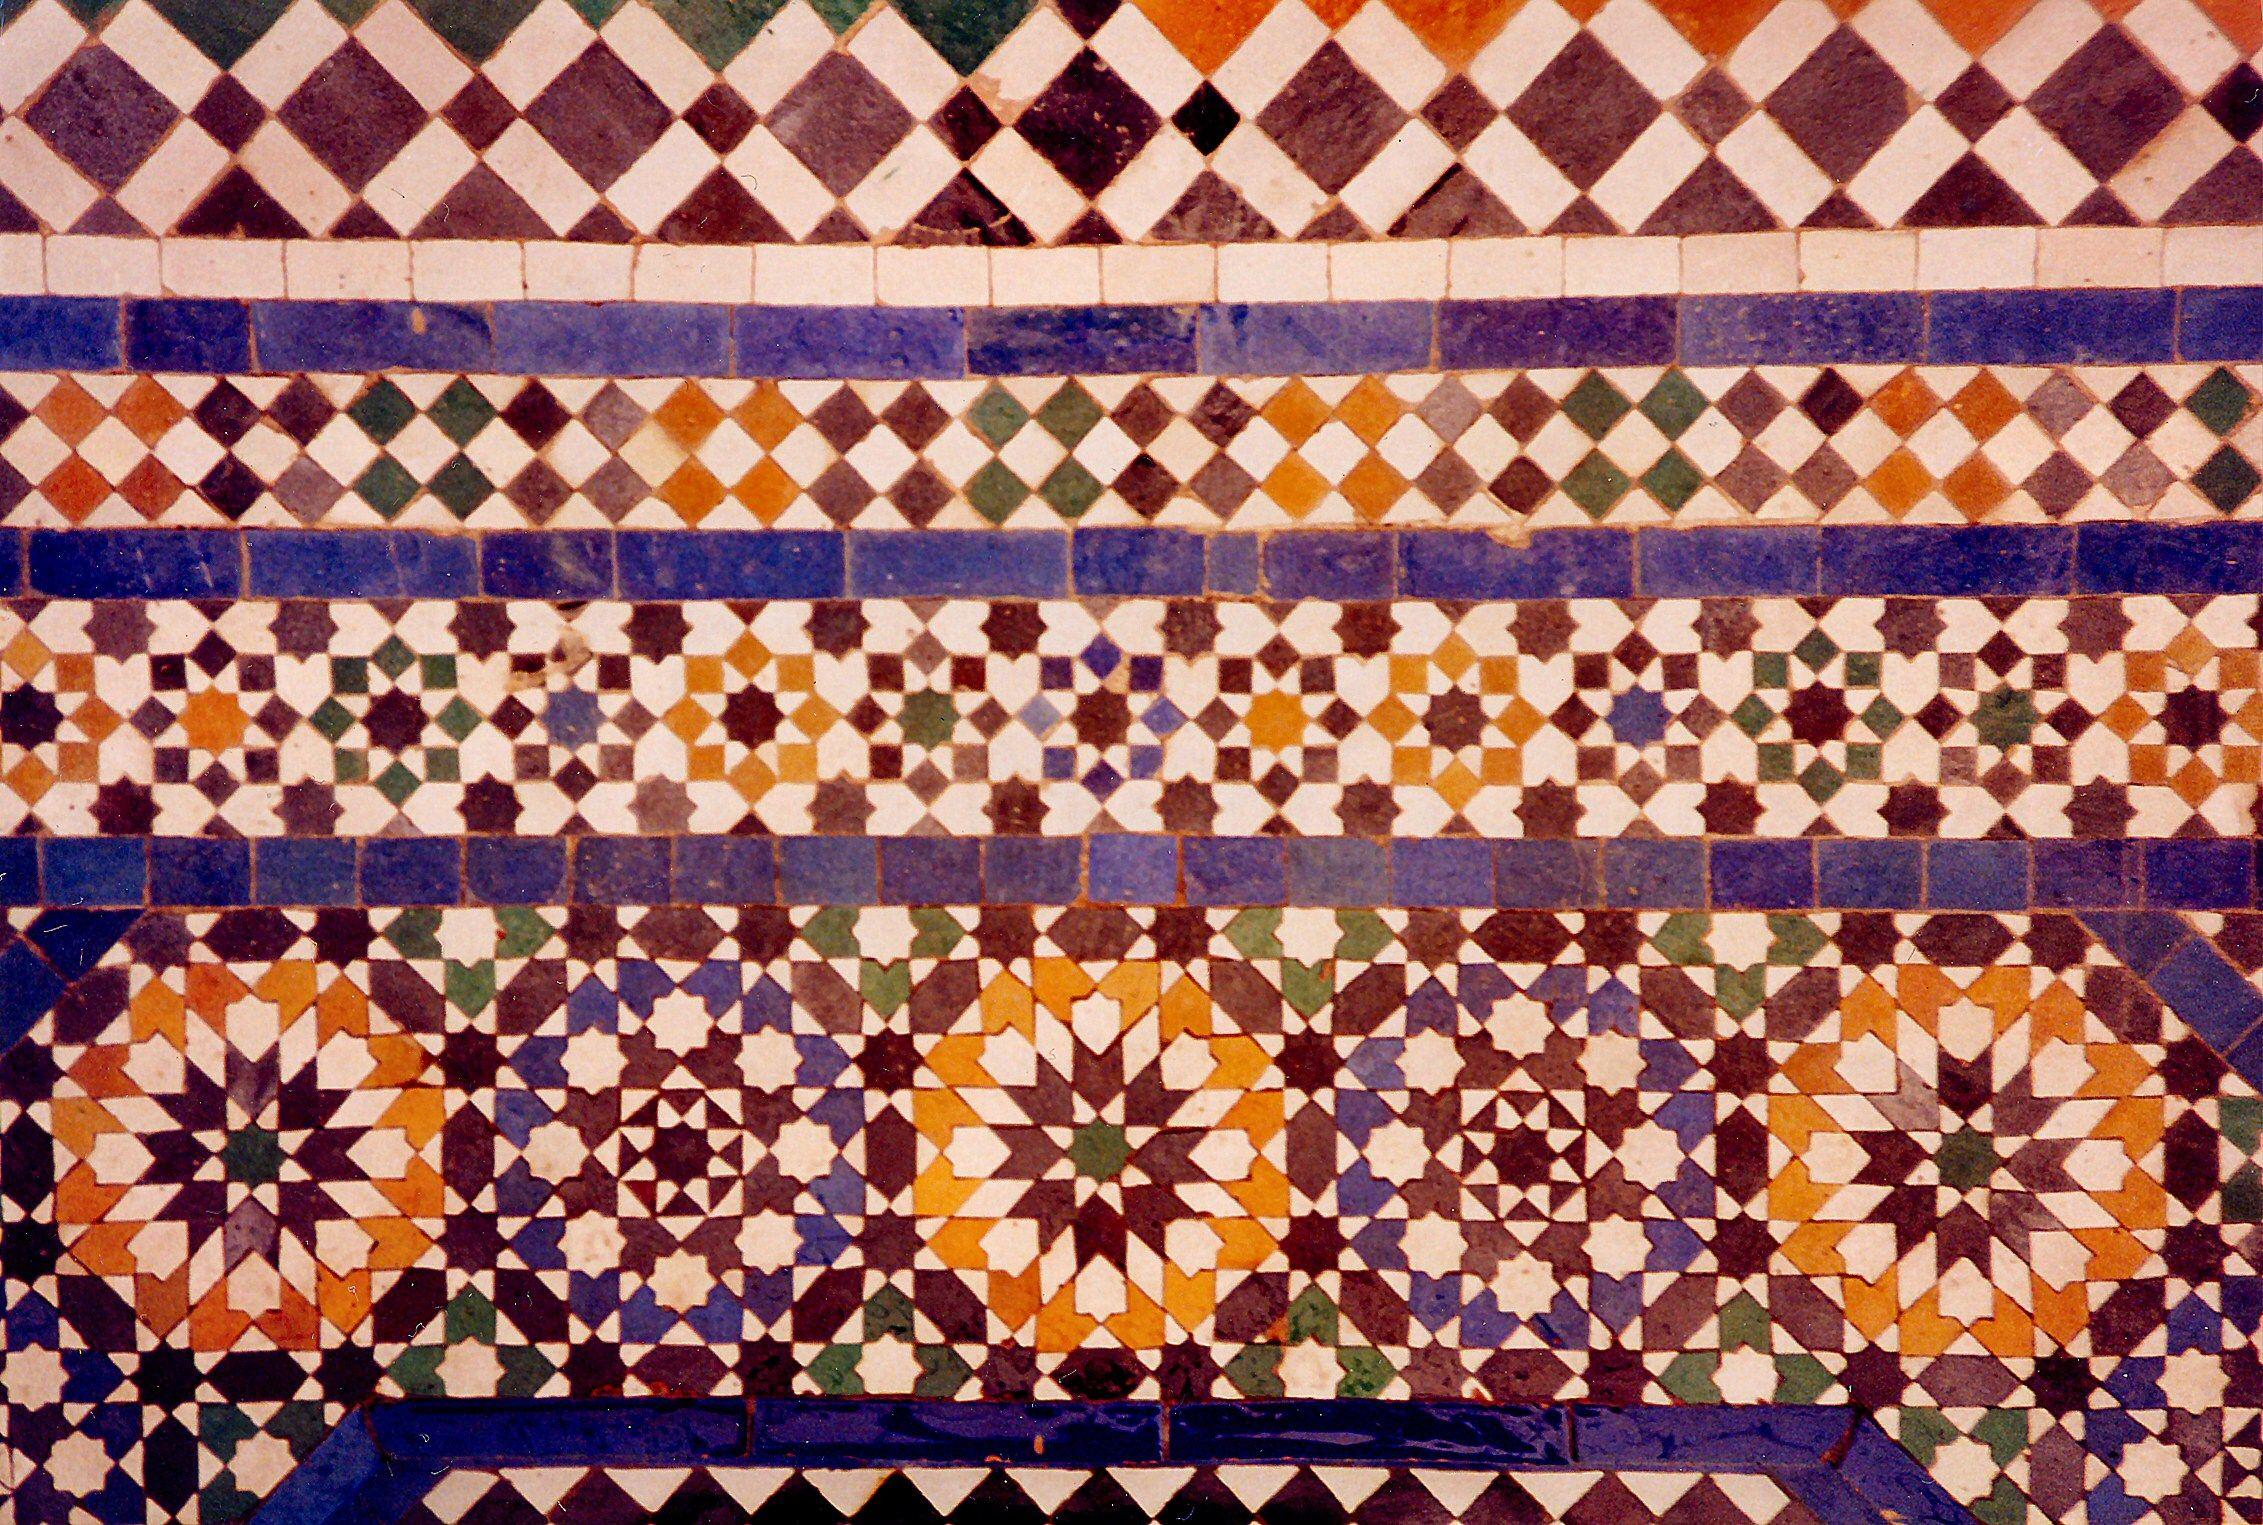 Tessellation Wikipedia The Free Encyclopedia Indian Fashions